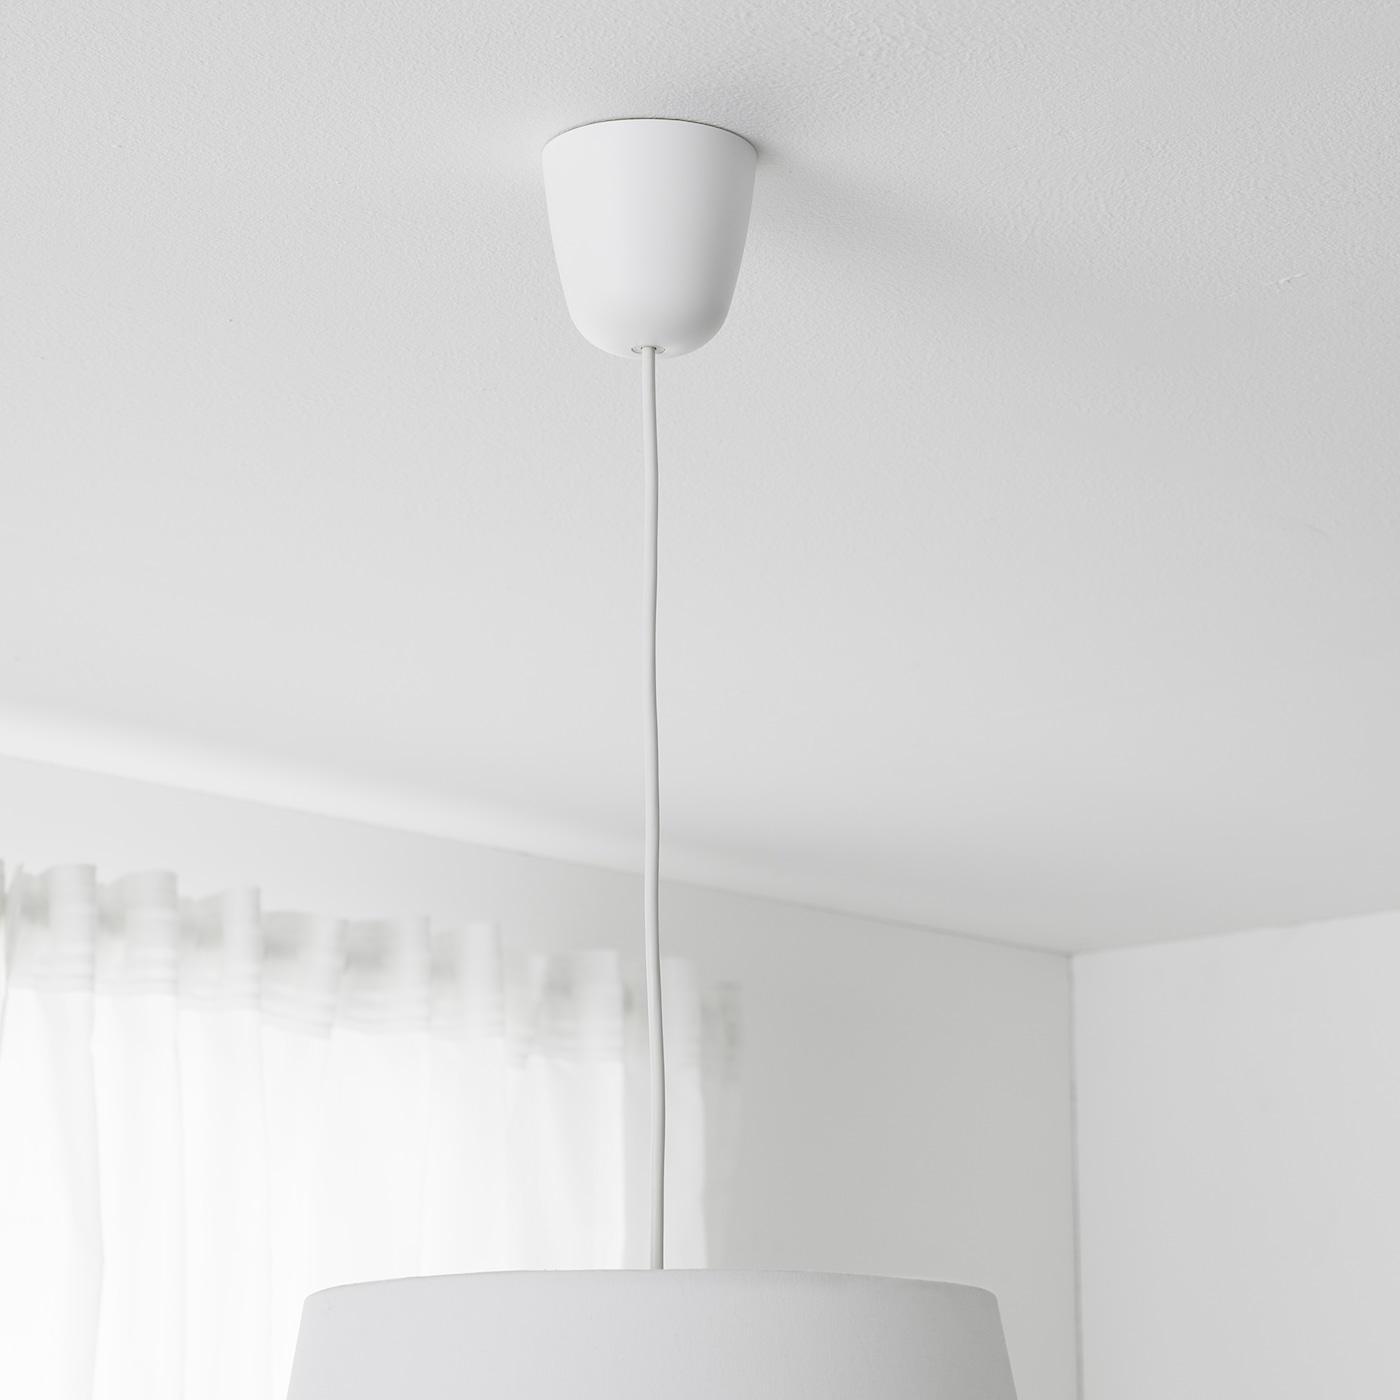 Lampenschirm Ikea Weiß